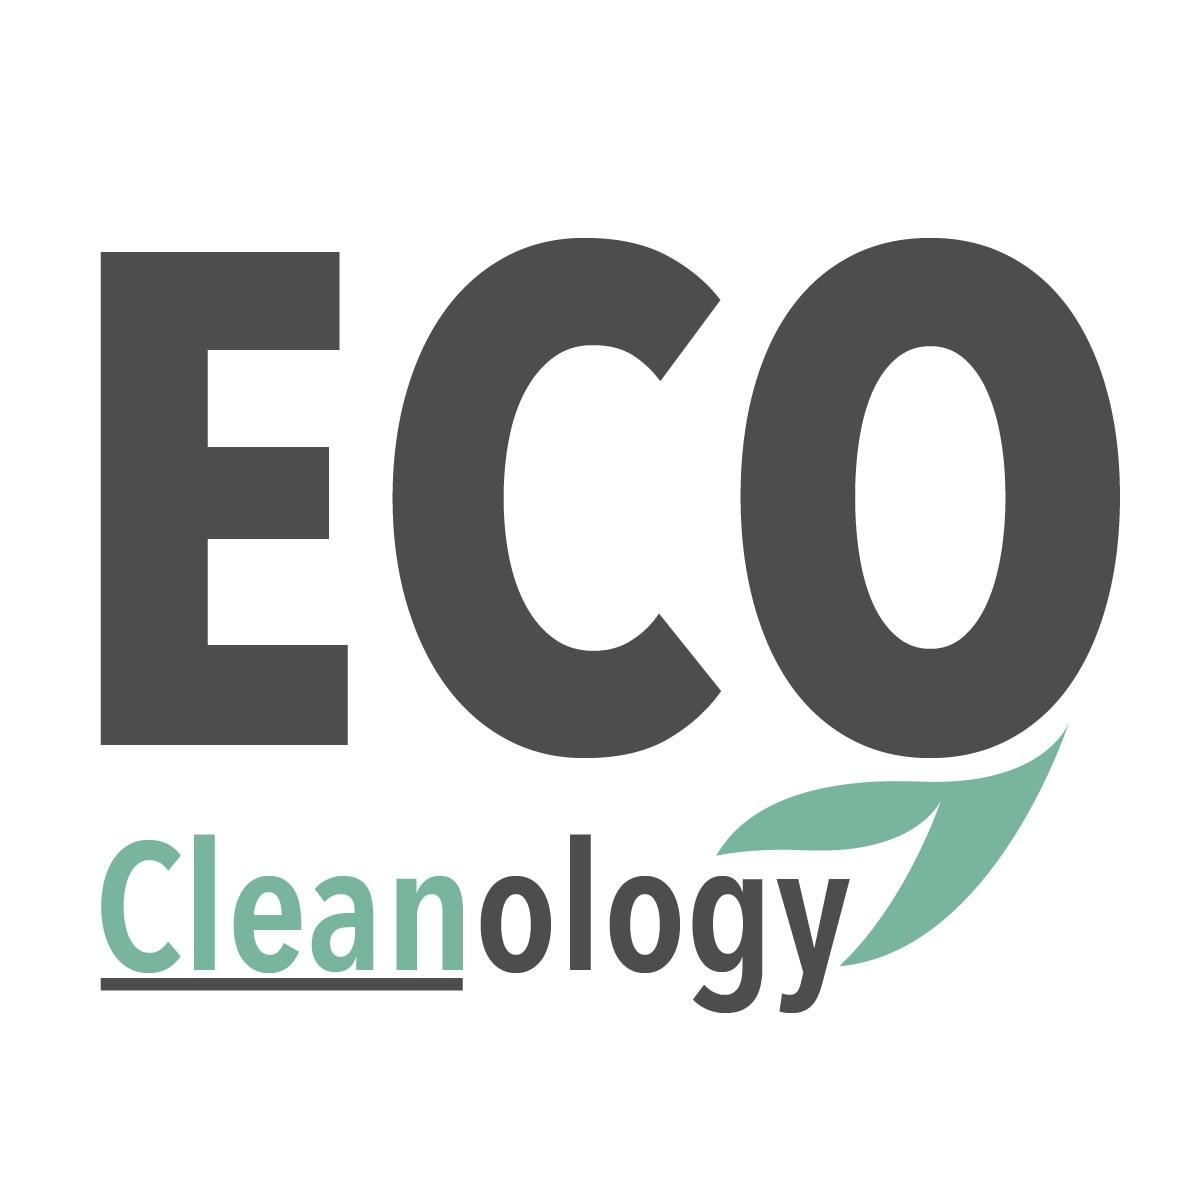 Eco-Cleanology logo